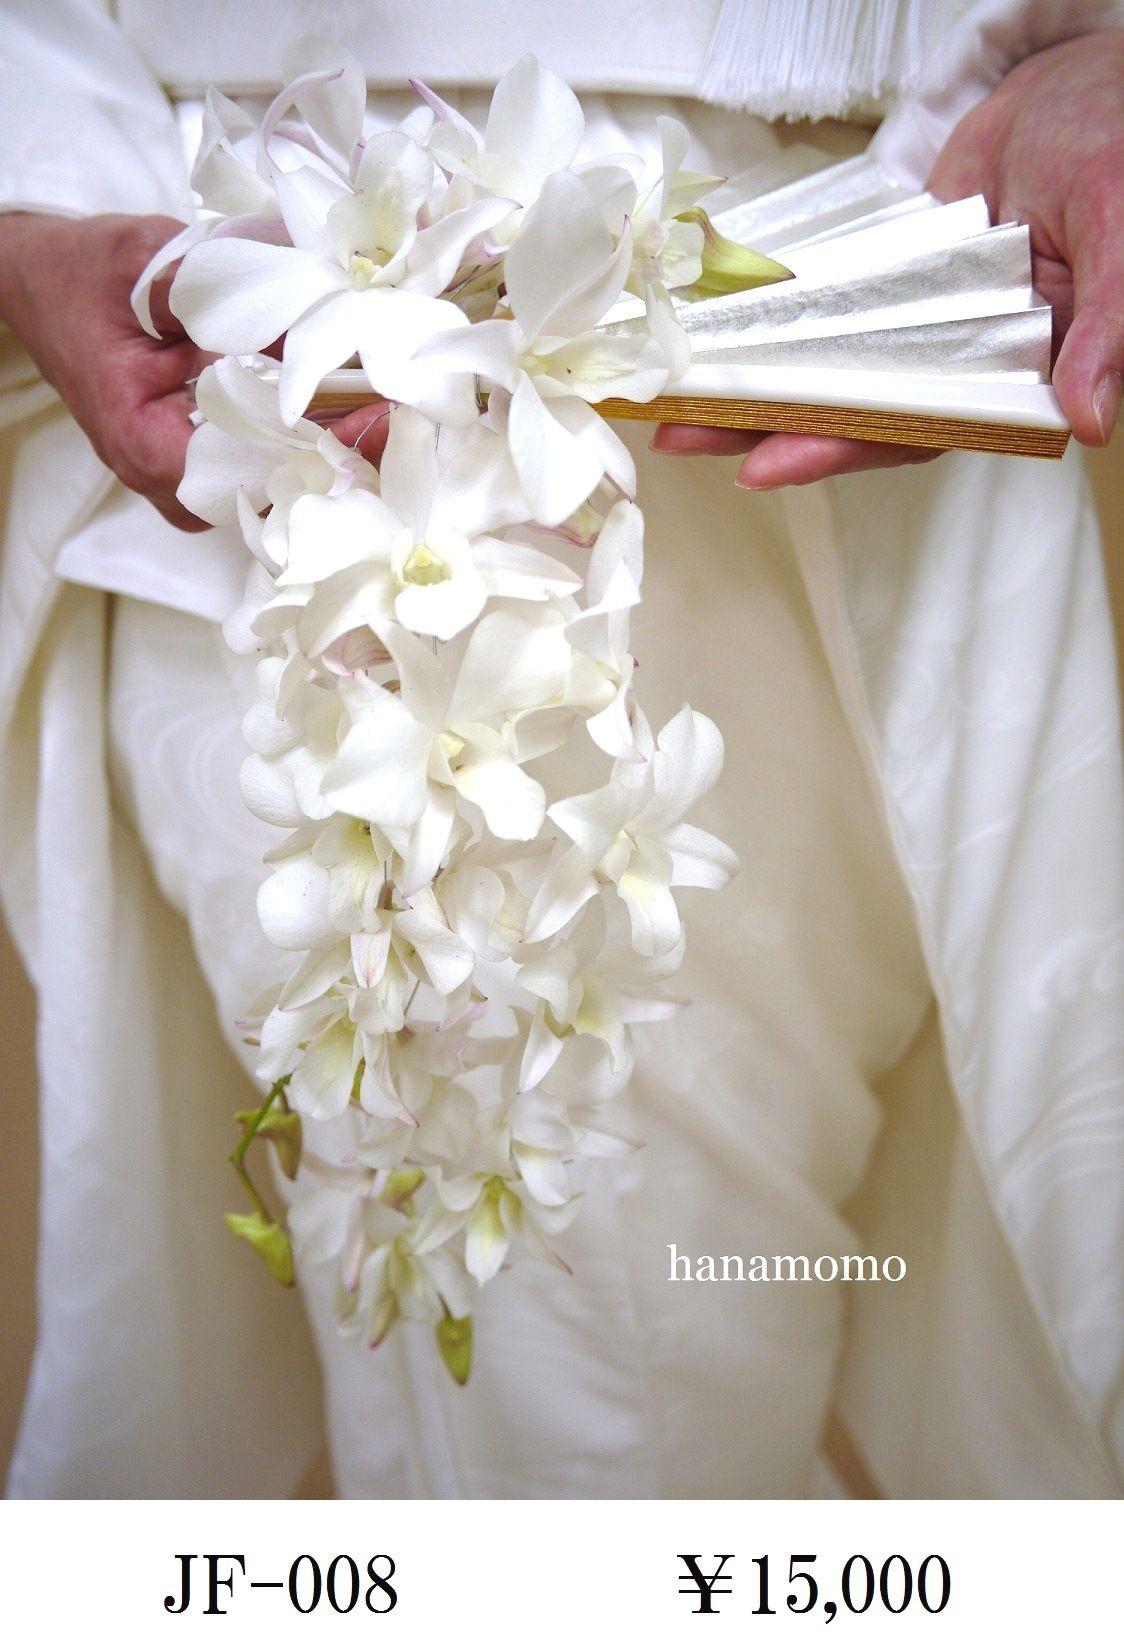 Japanese wedding bouquet i just like the hanging flowers in this japanese wedding bouquet i just like the hanging flowers in this one would be izmirmasajfo